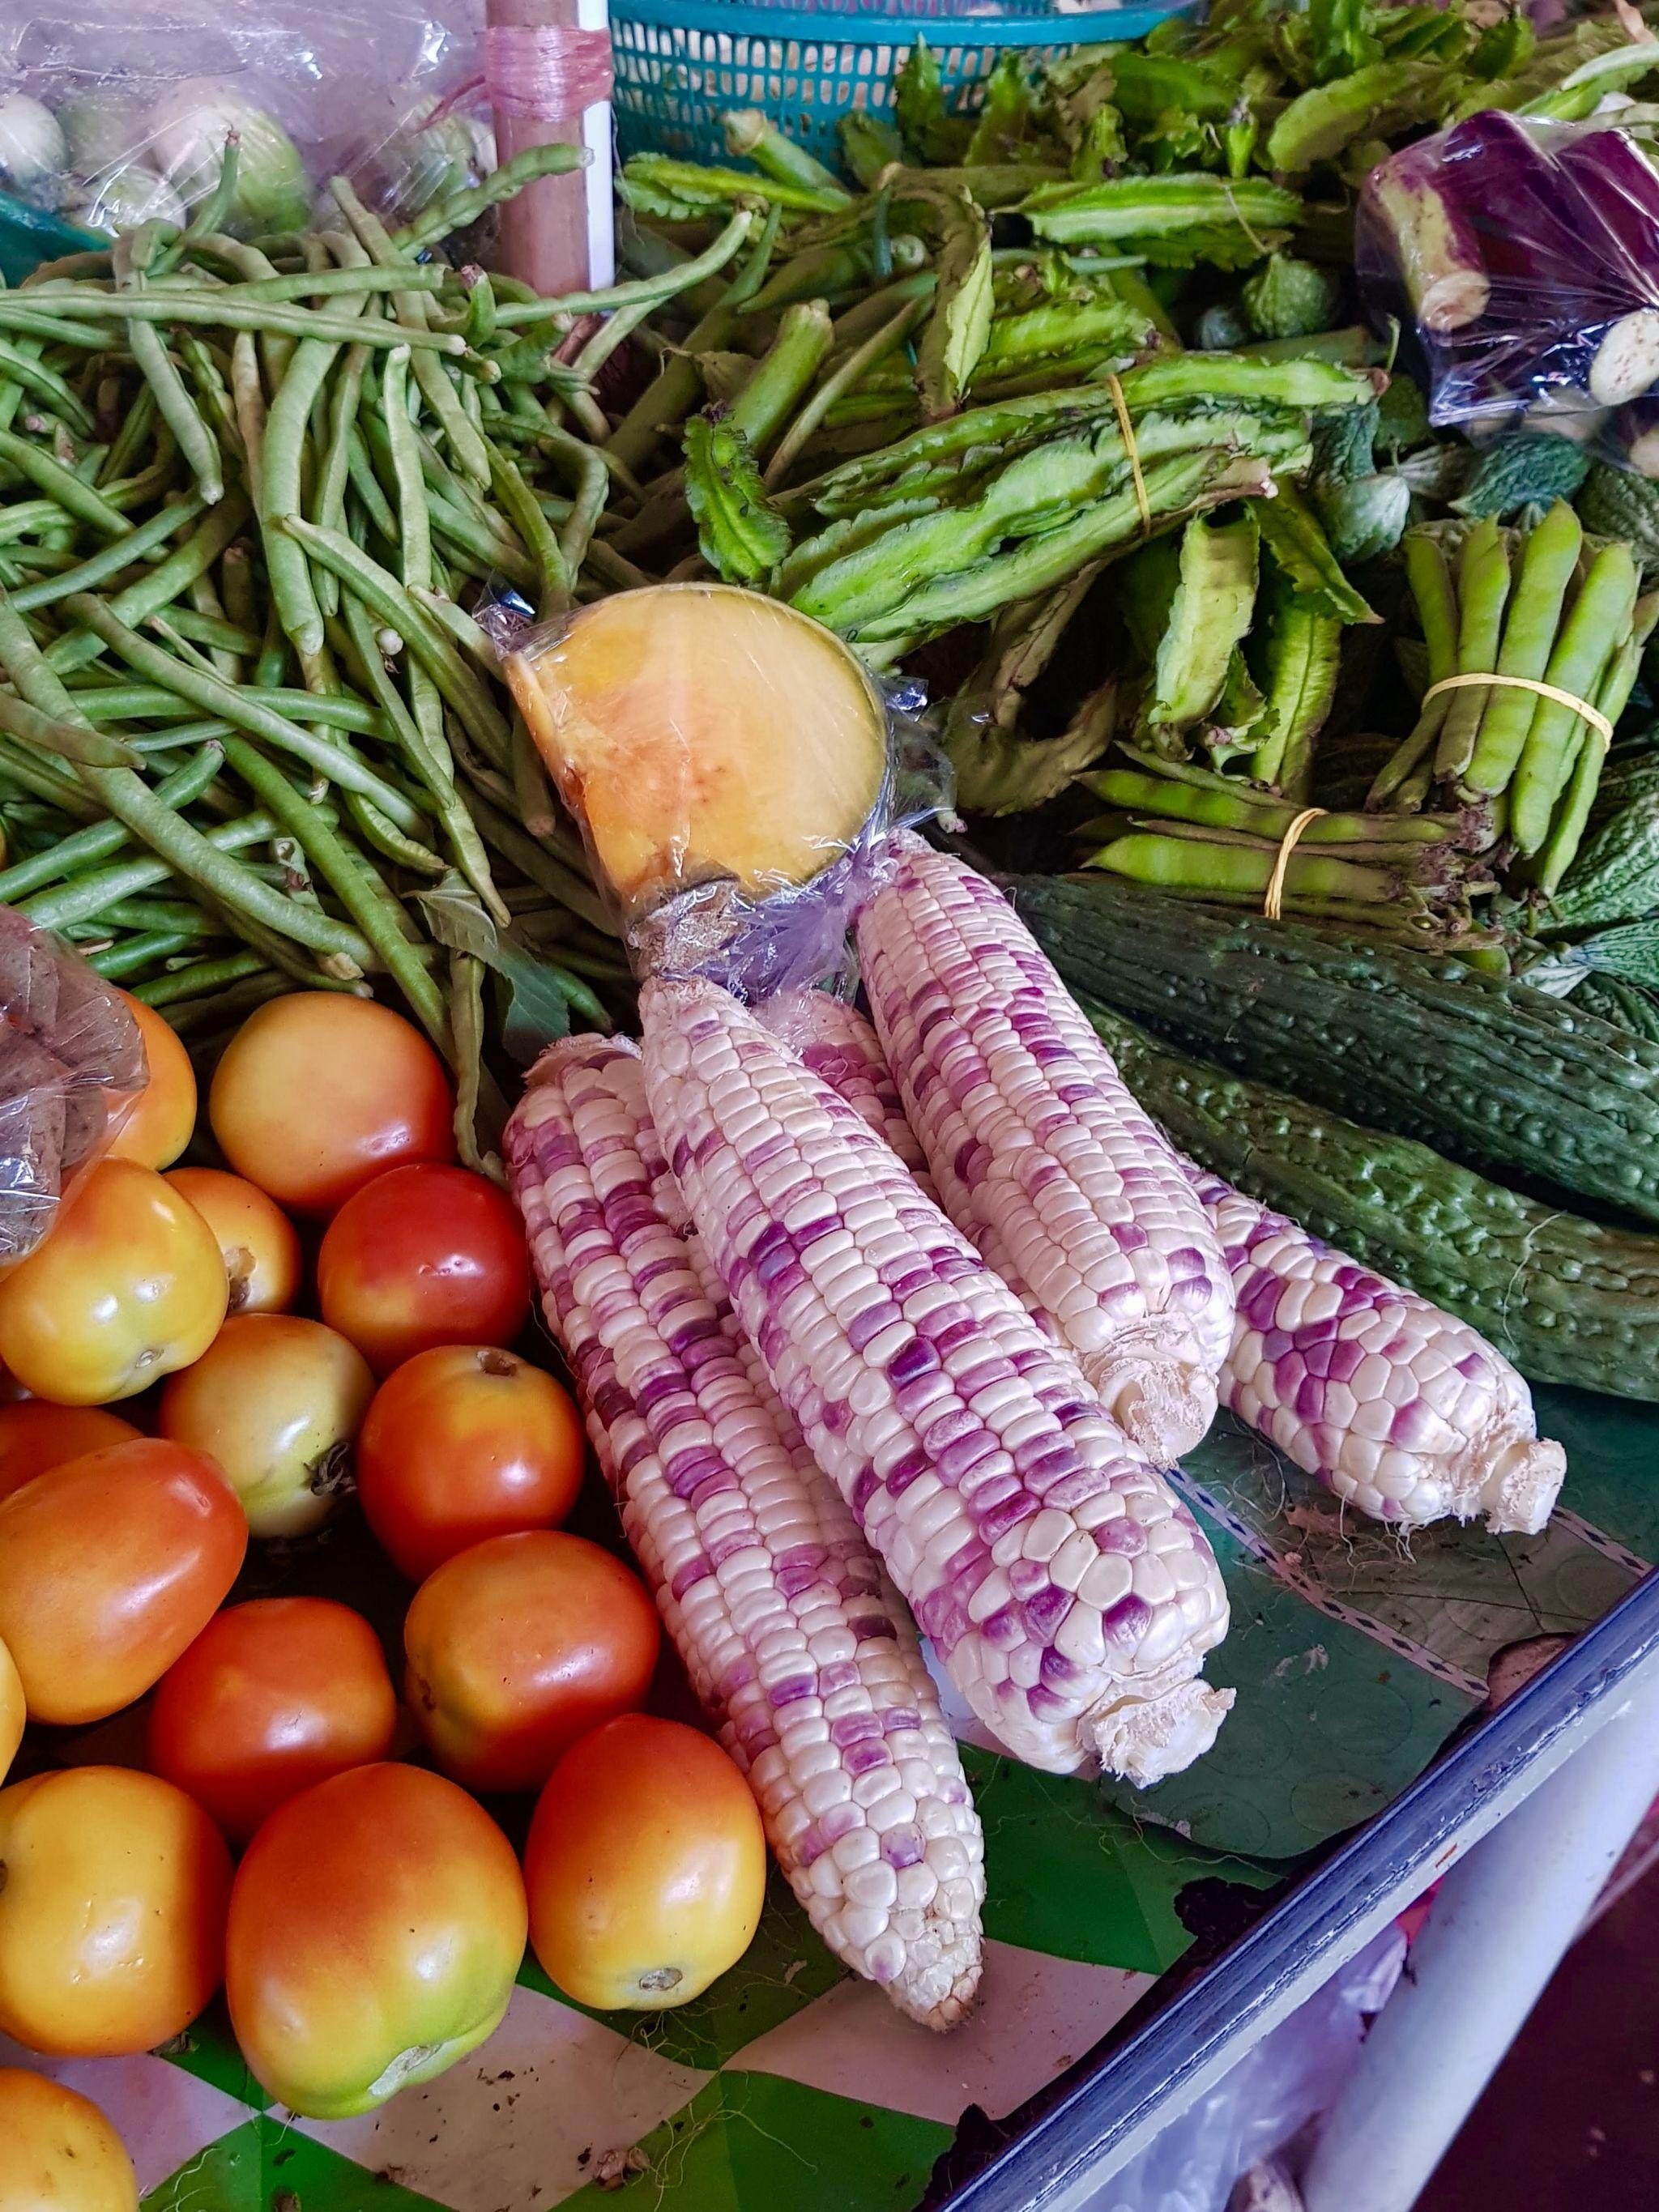 Philippines food market